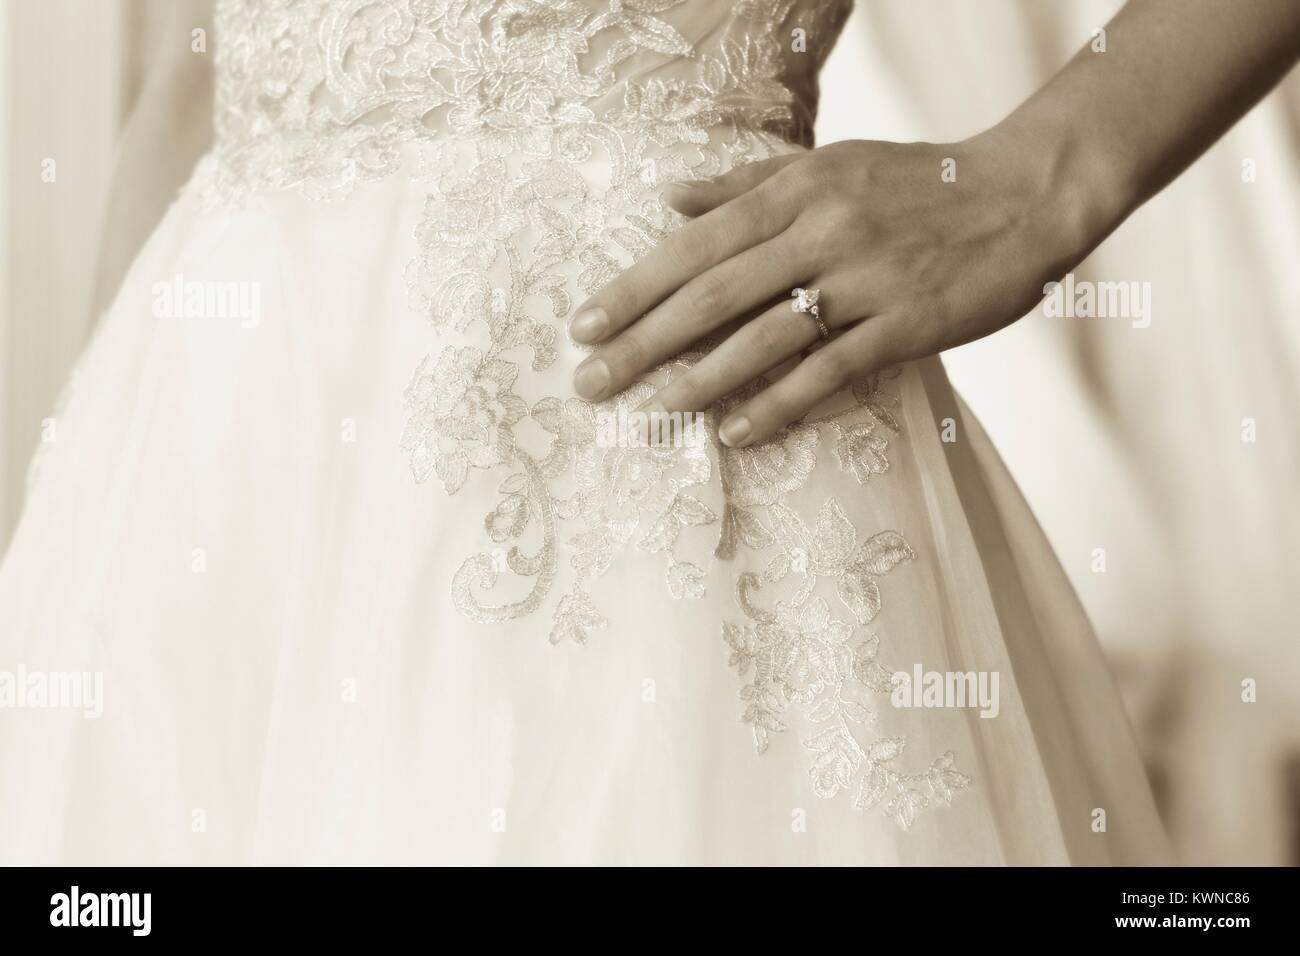 Bridal Preparations Stockfotos & Bridal Preparations Bilder - Alamy